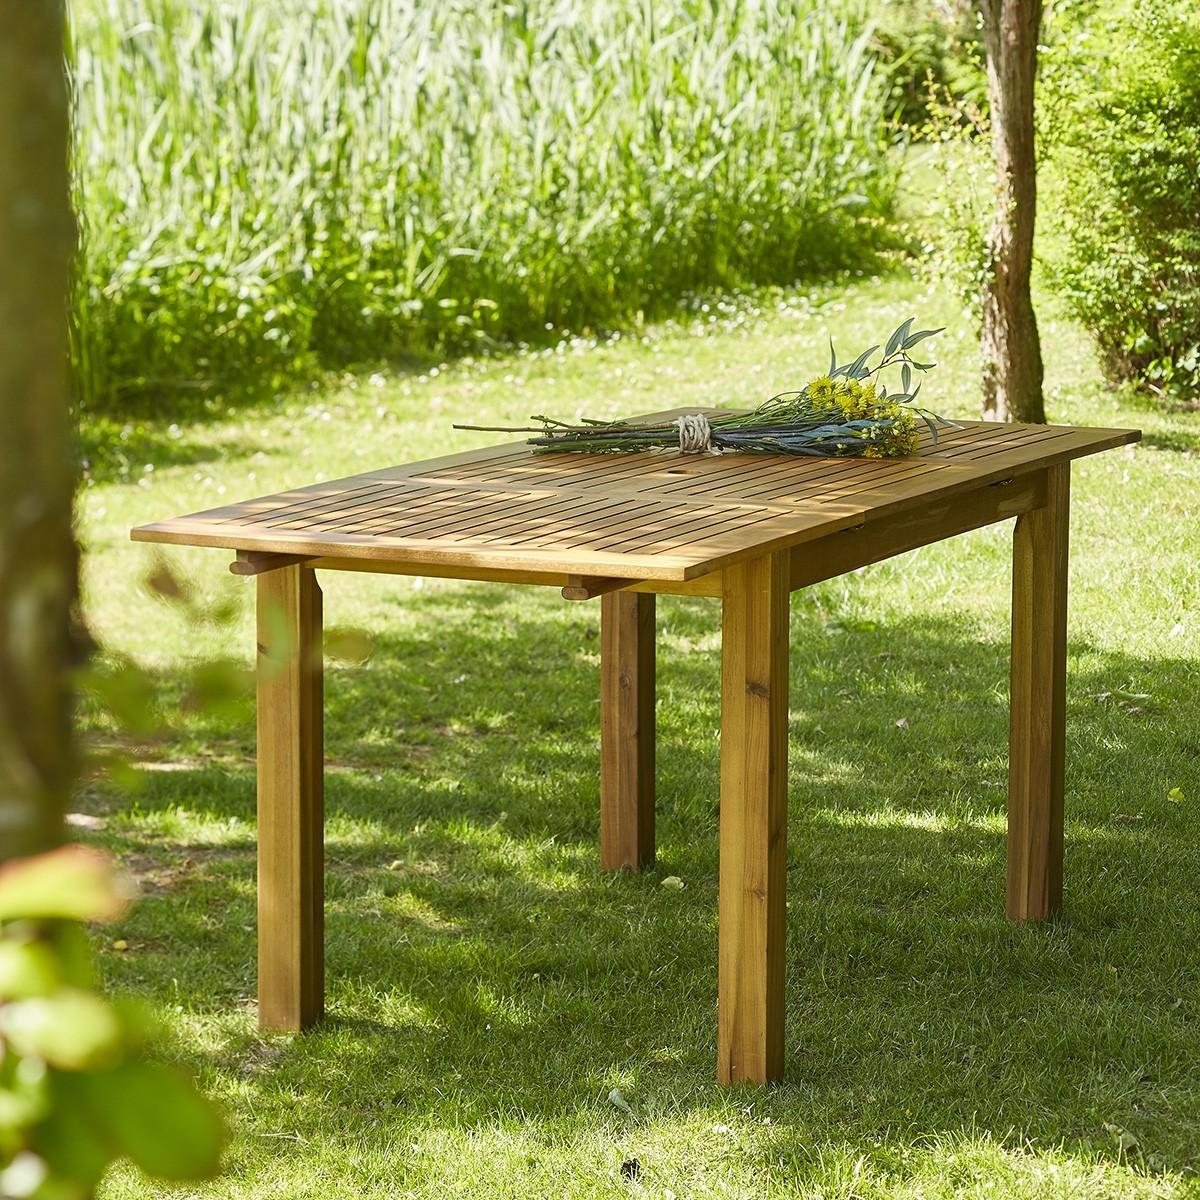 salon de jardin en bois d 39 acacia fsc noir rallonge 6 8. Black Bedroom Furniture Sets. Home Design Ideas